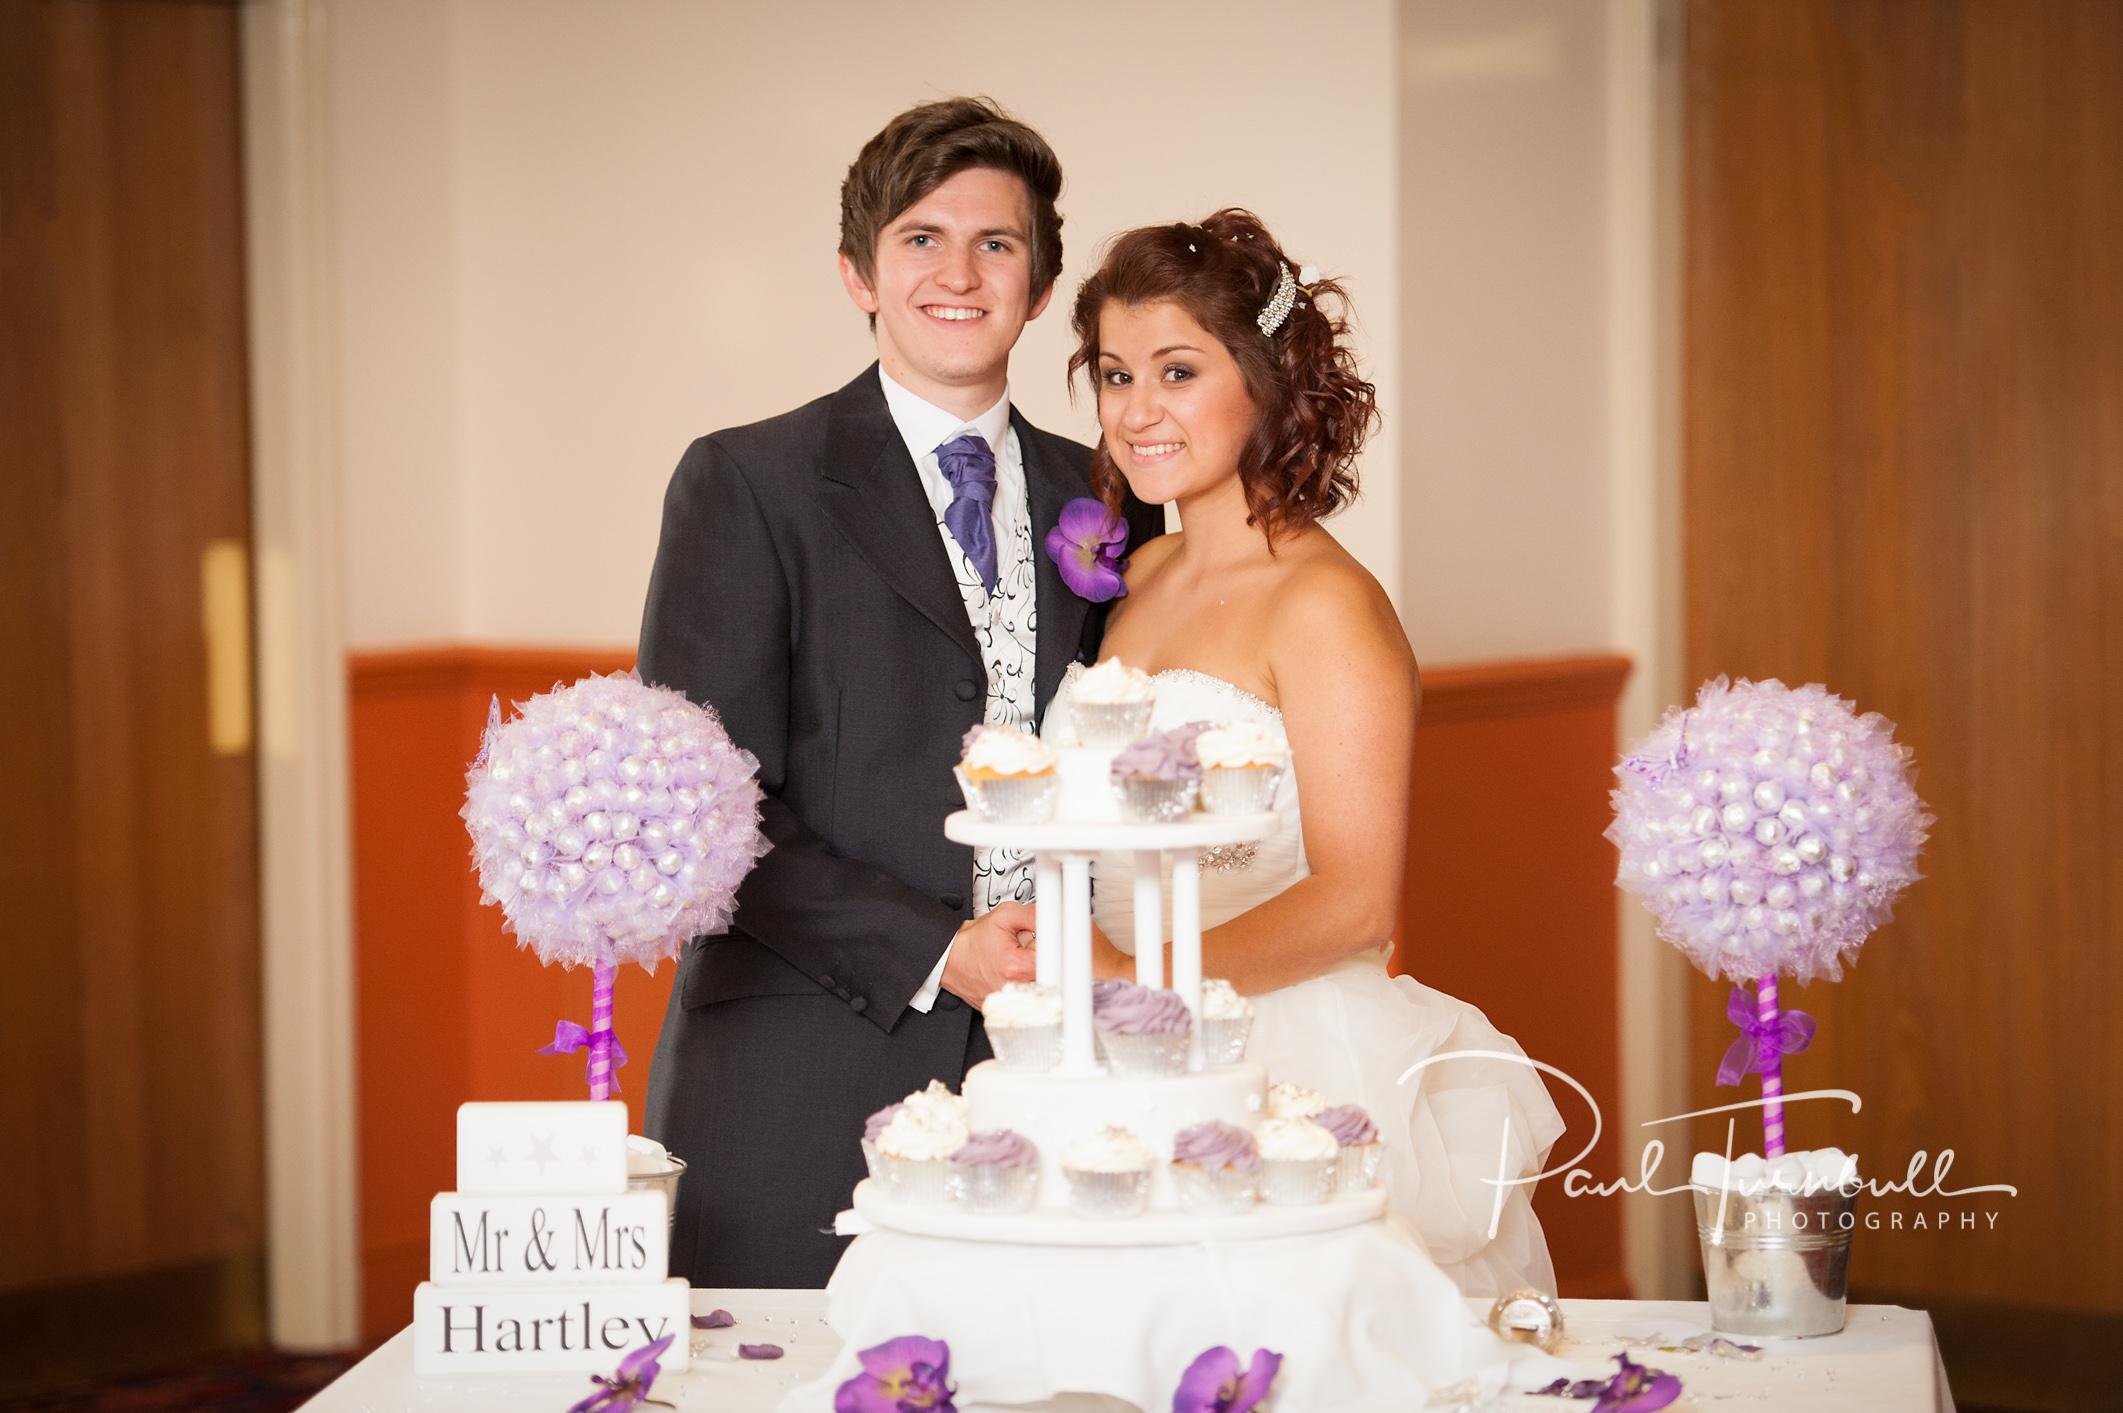 wedding-photography-healds-hall-liversedge-yorkshire-073.jpg